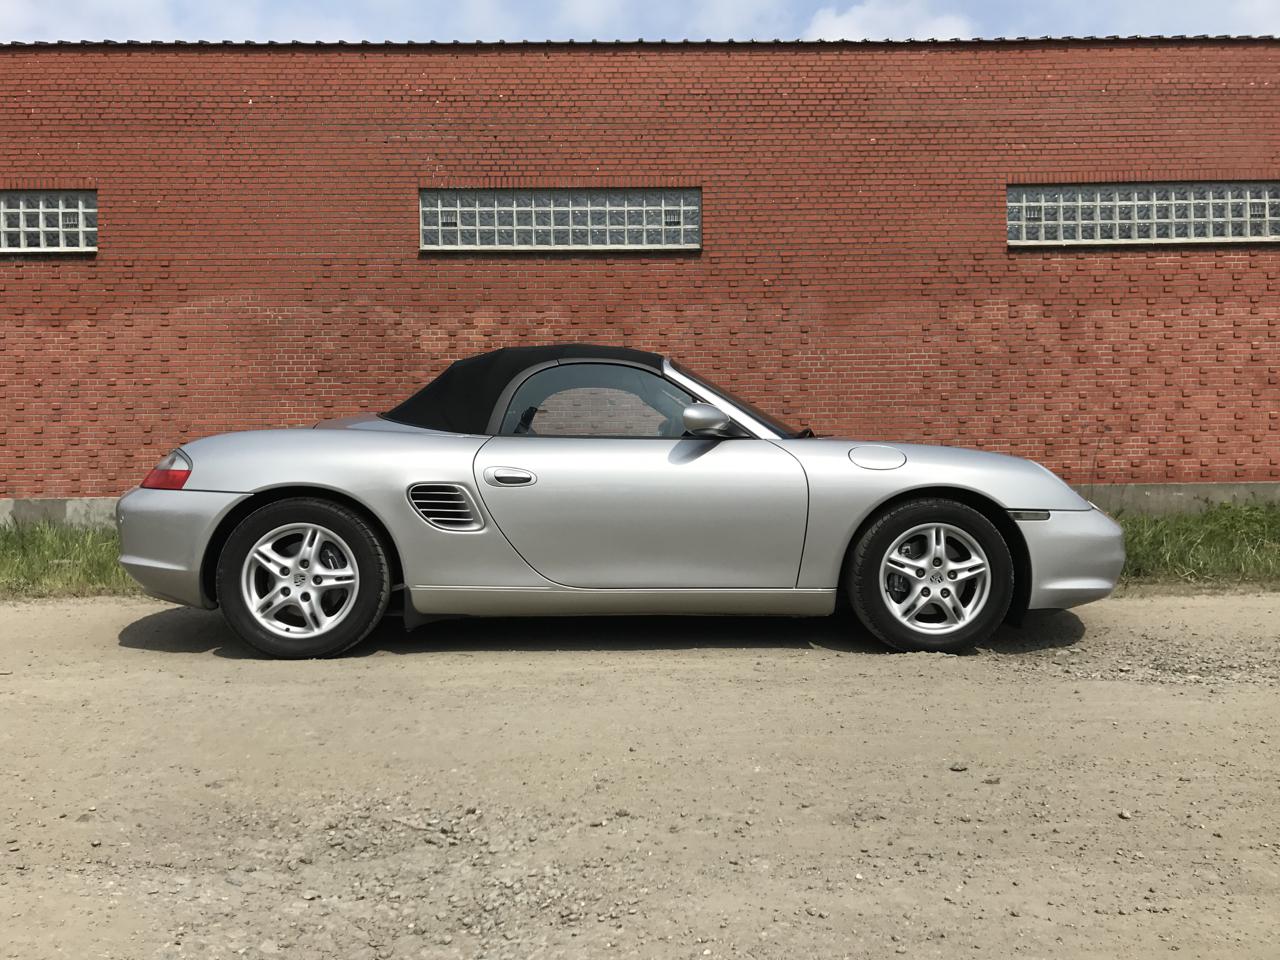 911 youngtimer - Porsche 986 Boxter 2,7L - Arctic Silver - 2003 - 1 of 6